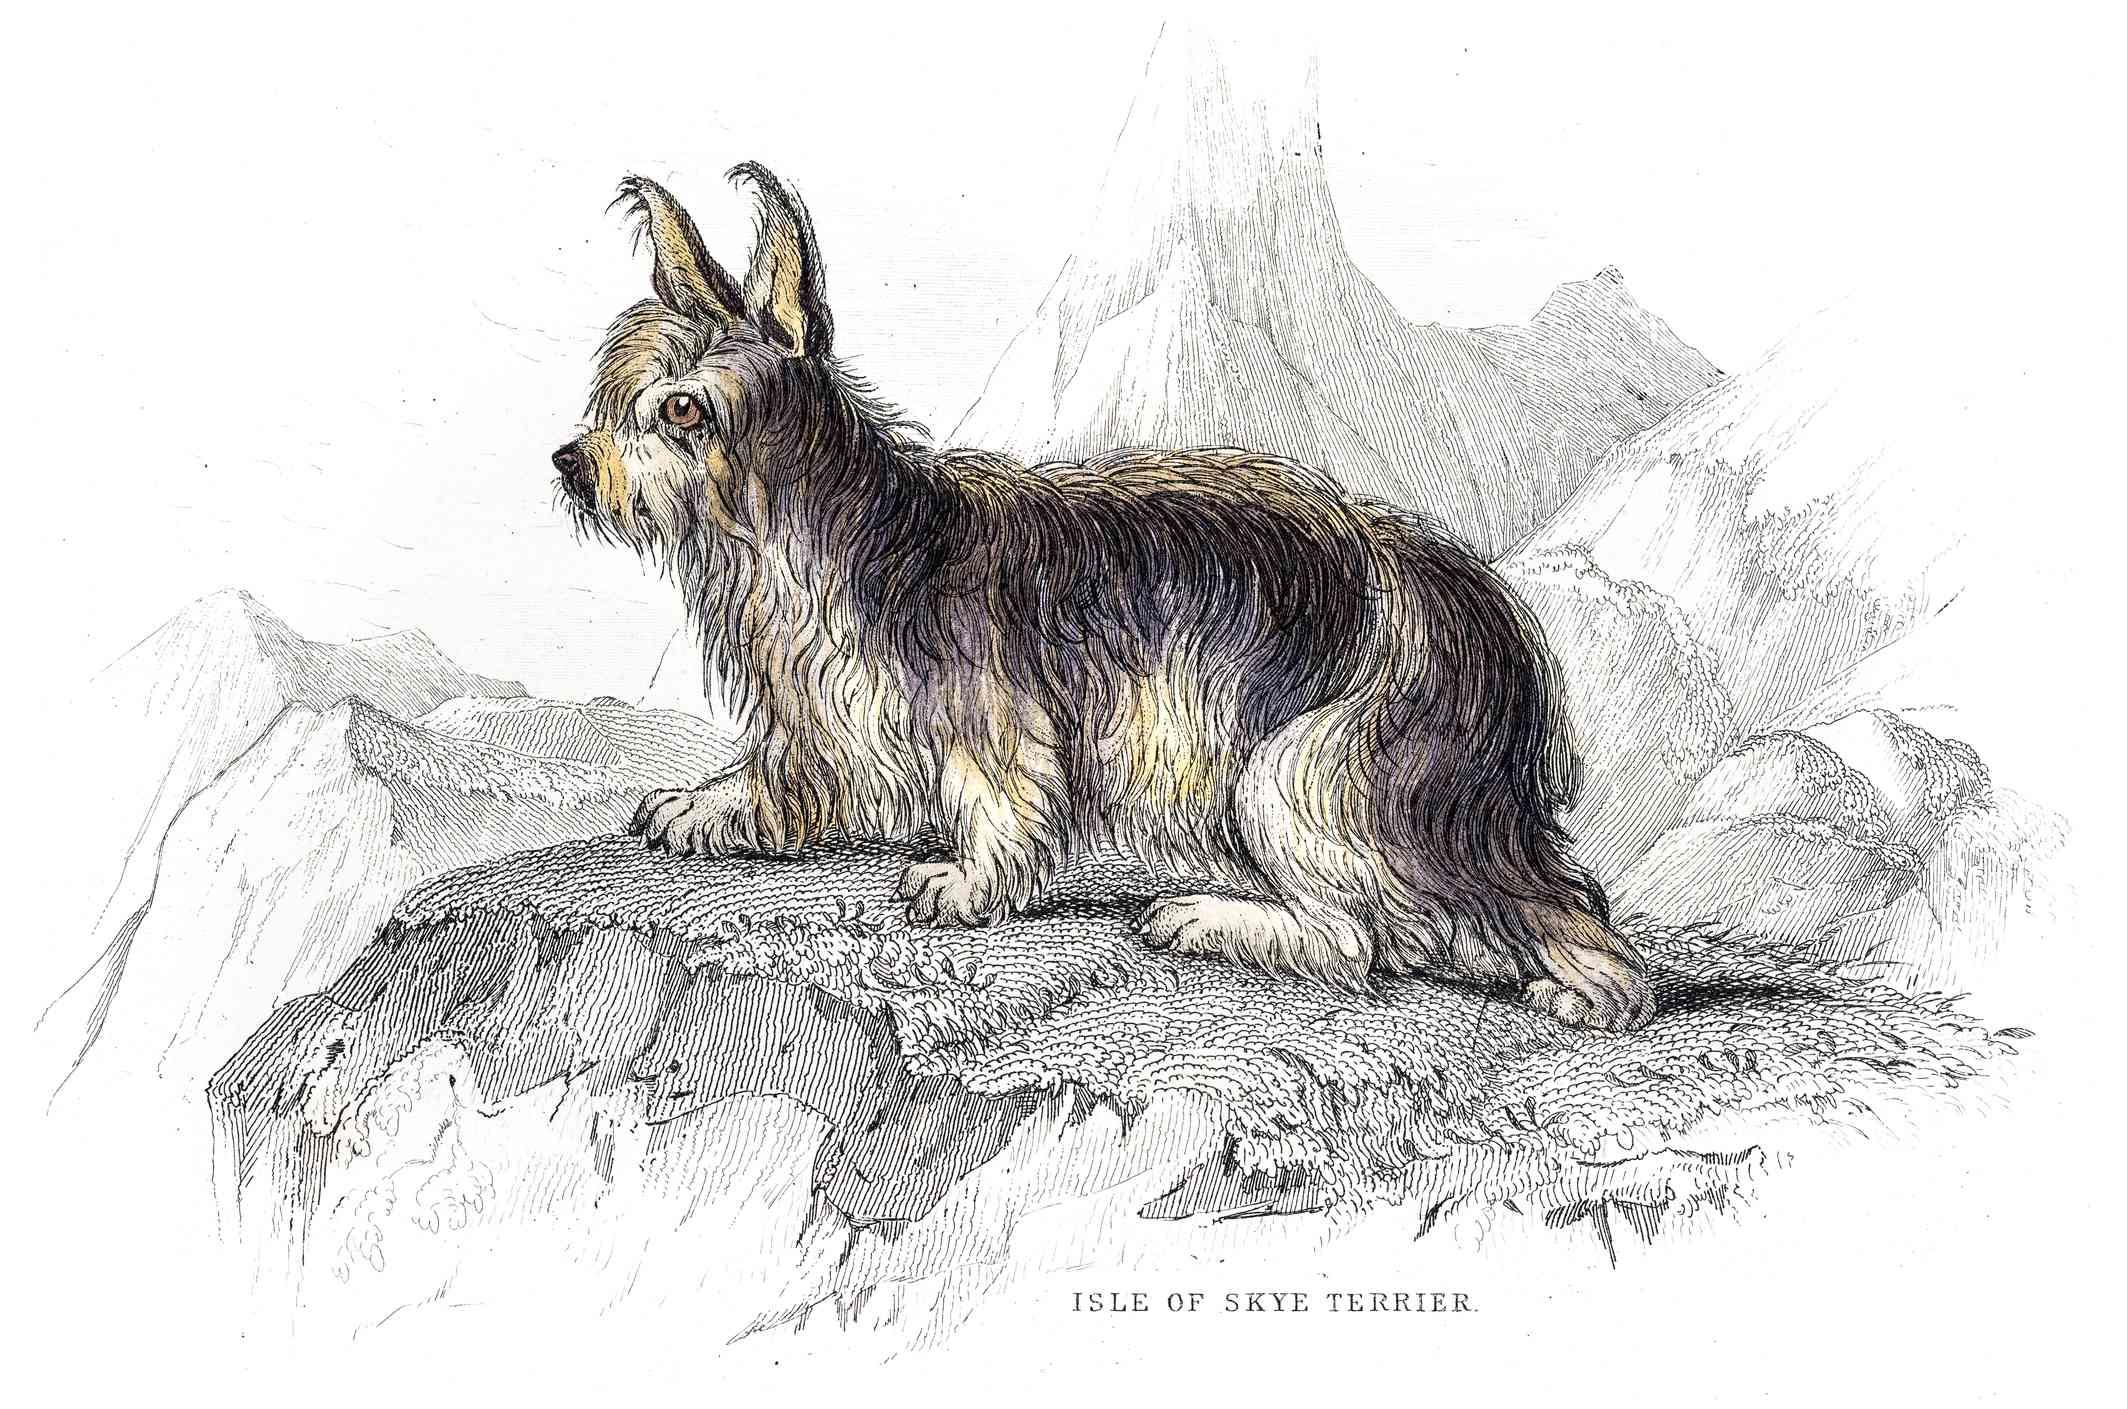 Illustration of Skye Terrier from William Jardine's